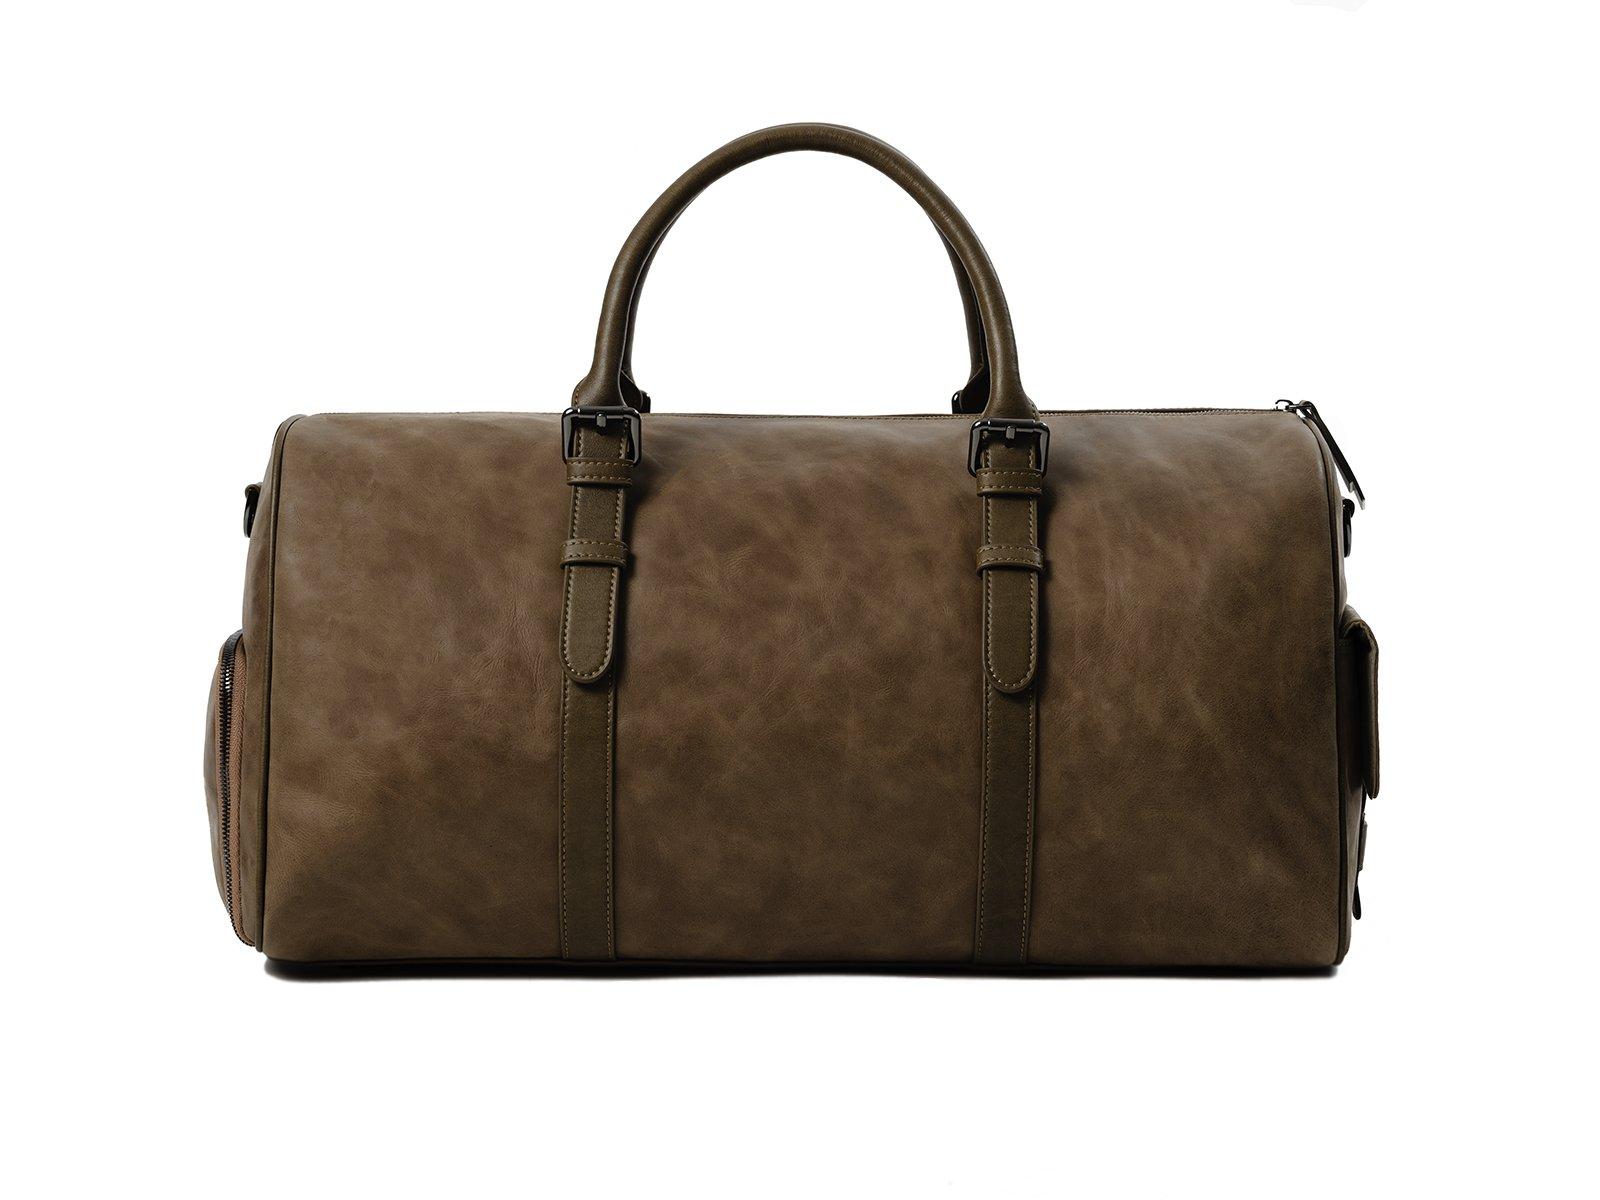 kingsman tan leather duffle bag